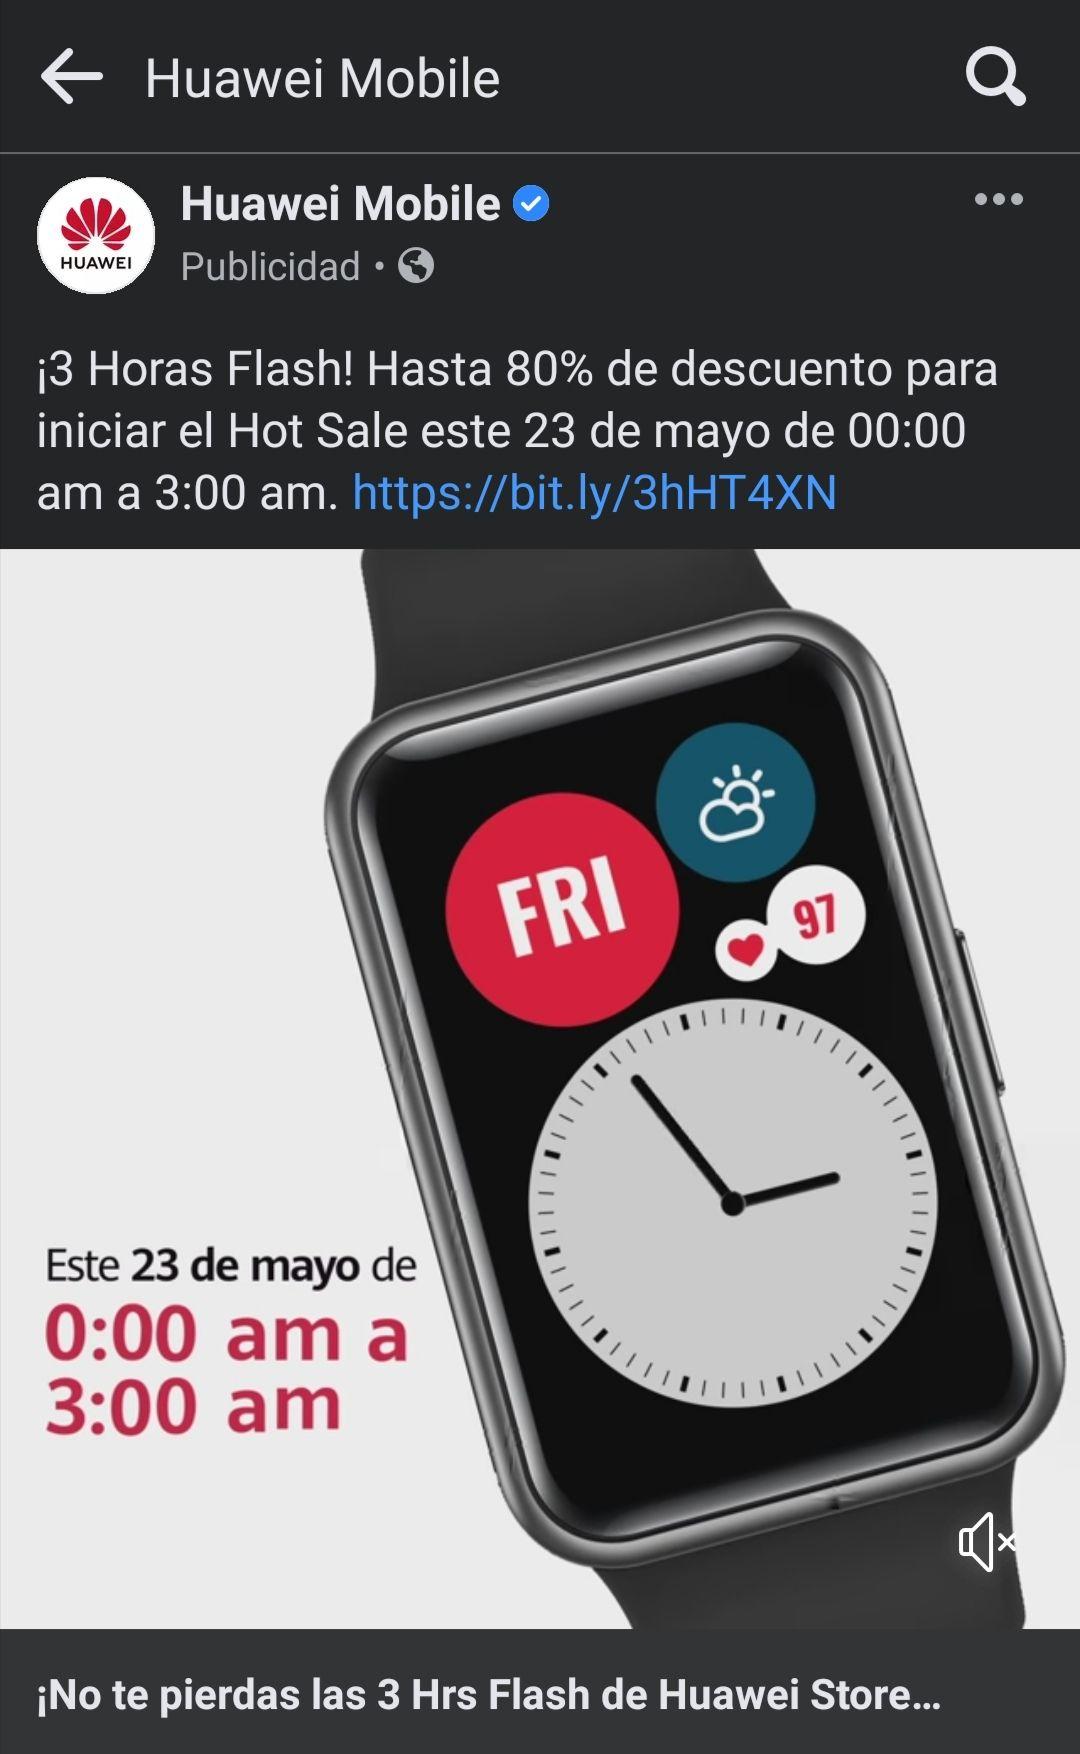 Huawei: Venta Flash 23 de mayo hasta 80%